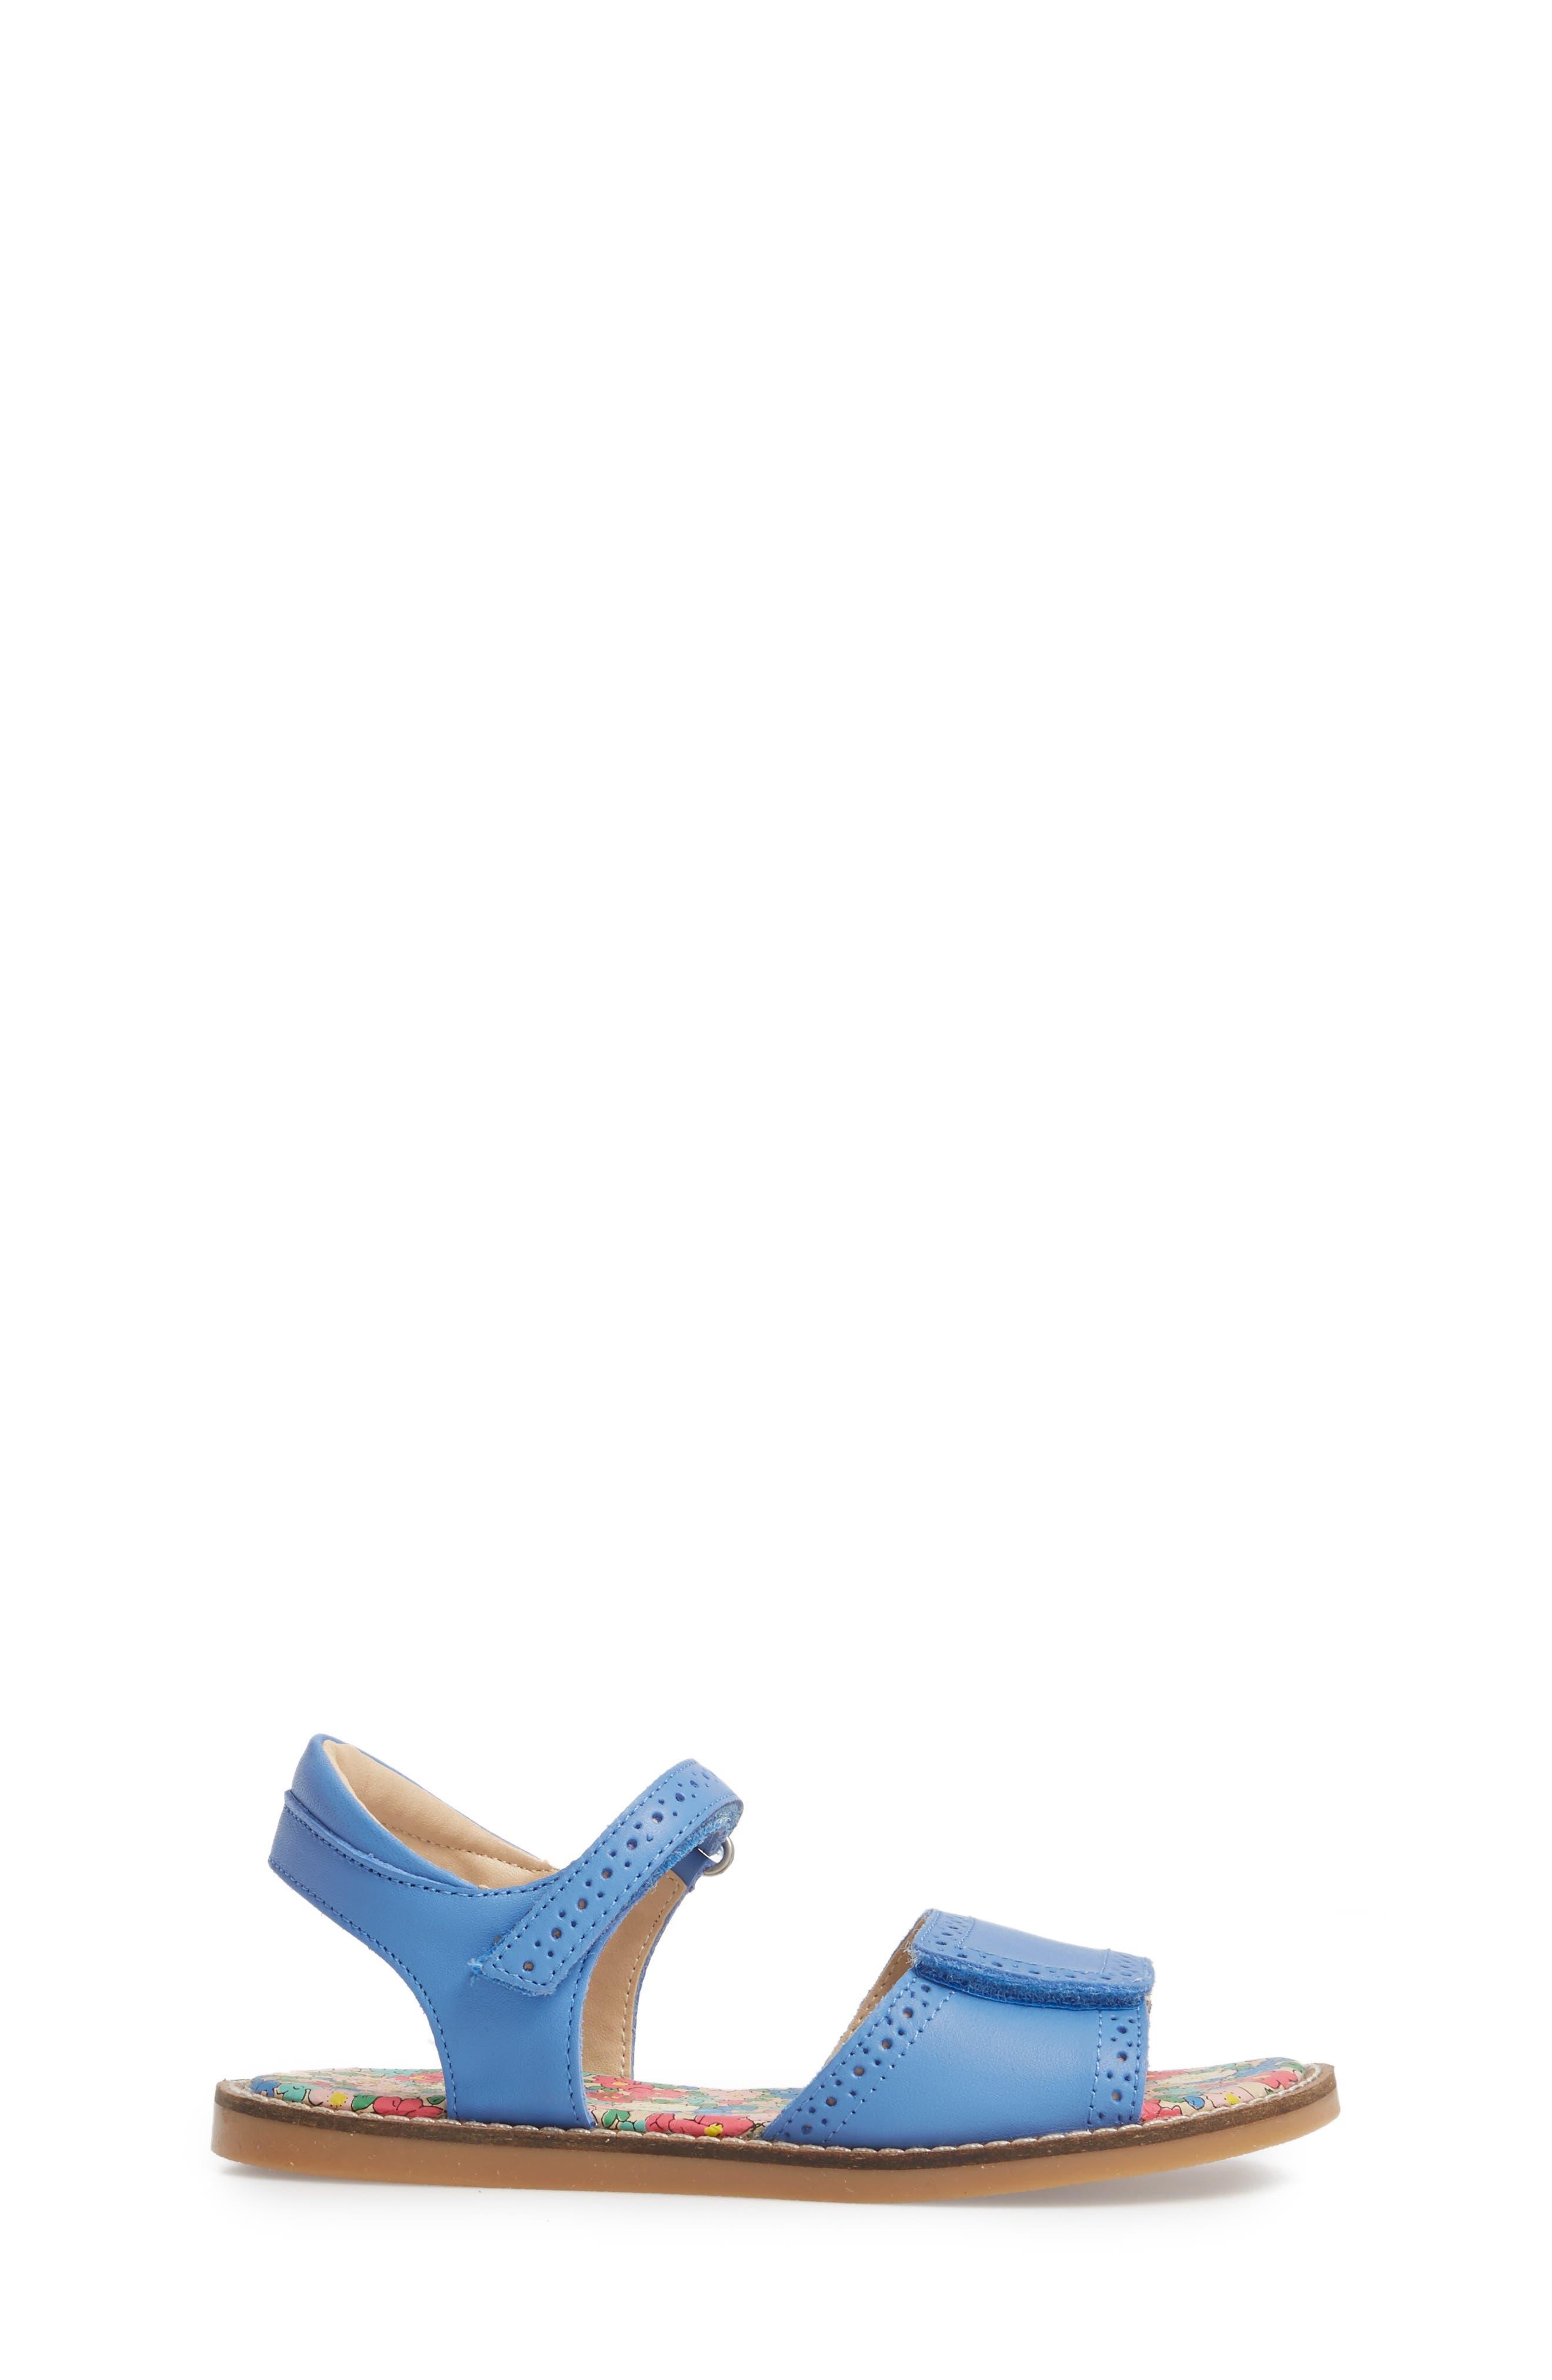 Adjustable Quarter Strap Sandal,                             Alternate thumbnail 3, color,                             Penzance Blue